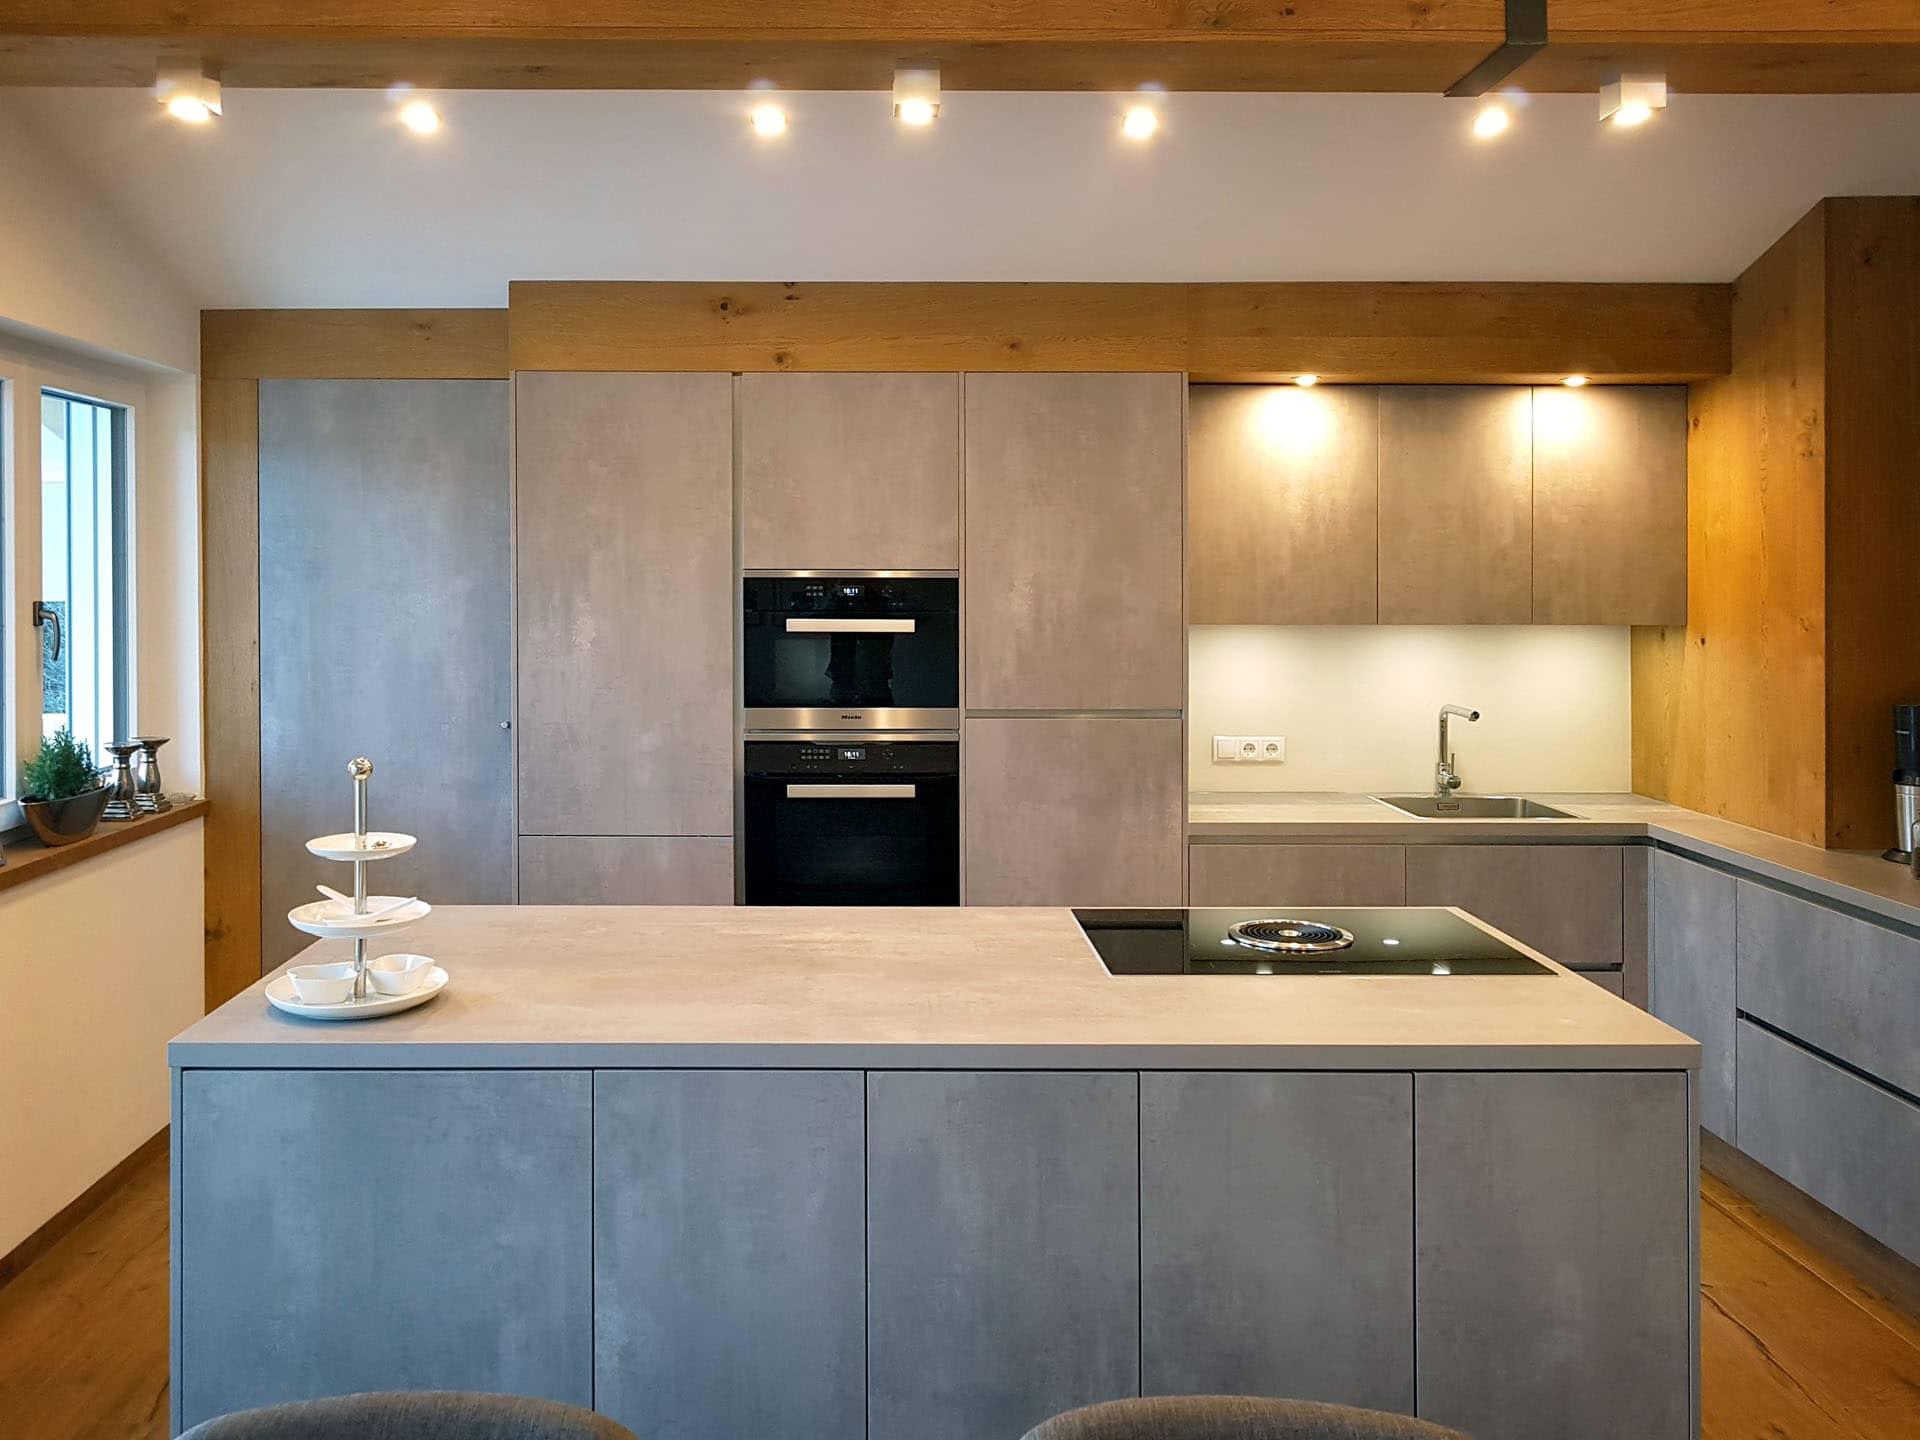 moderne kuche in betonoptik – caseconrad